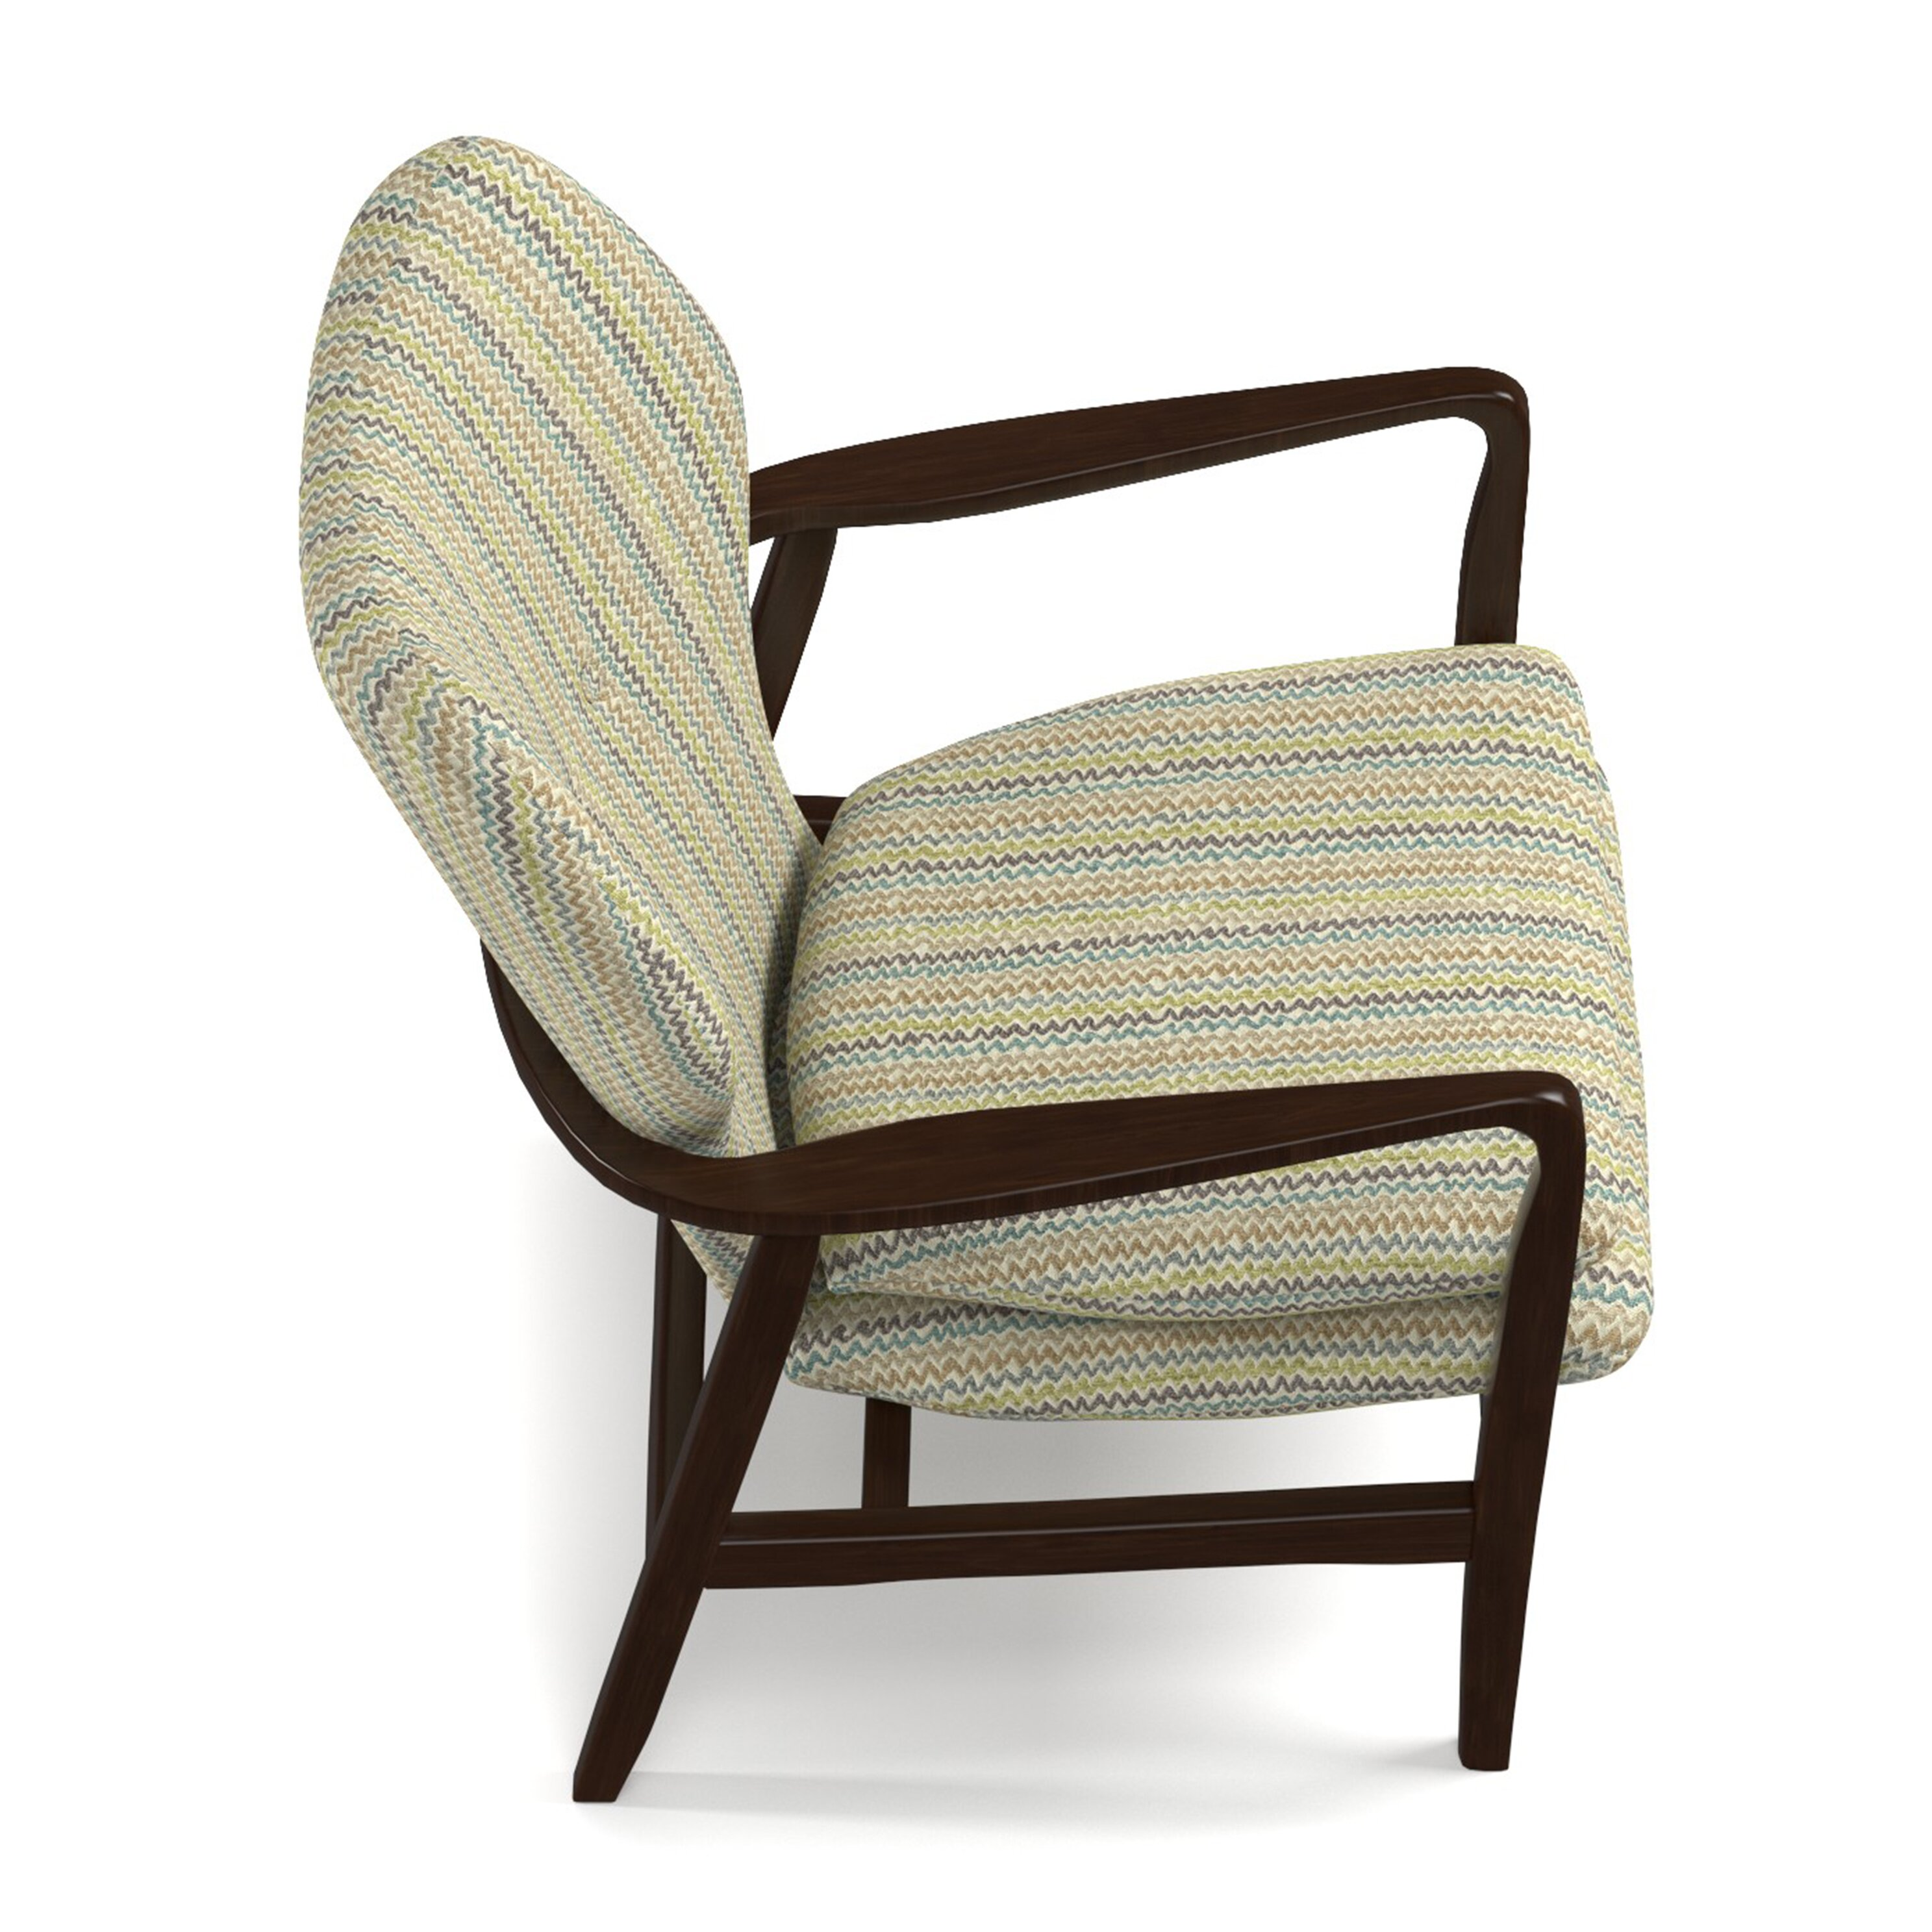 Brayden Studio Samson Wood Arm Chair Amp Reviews Wayfair